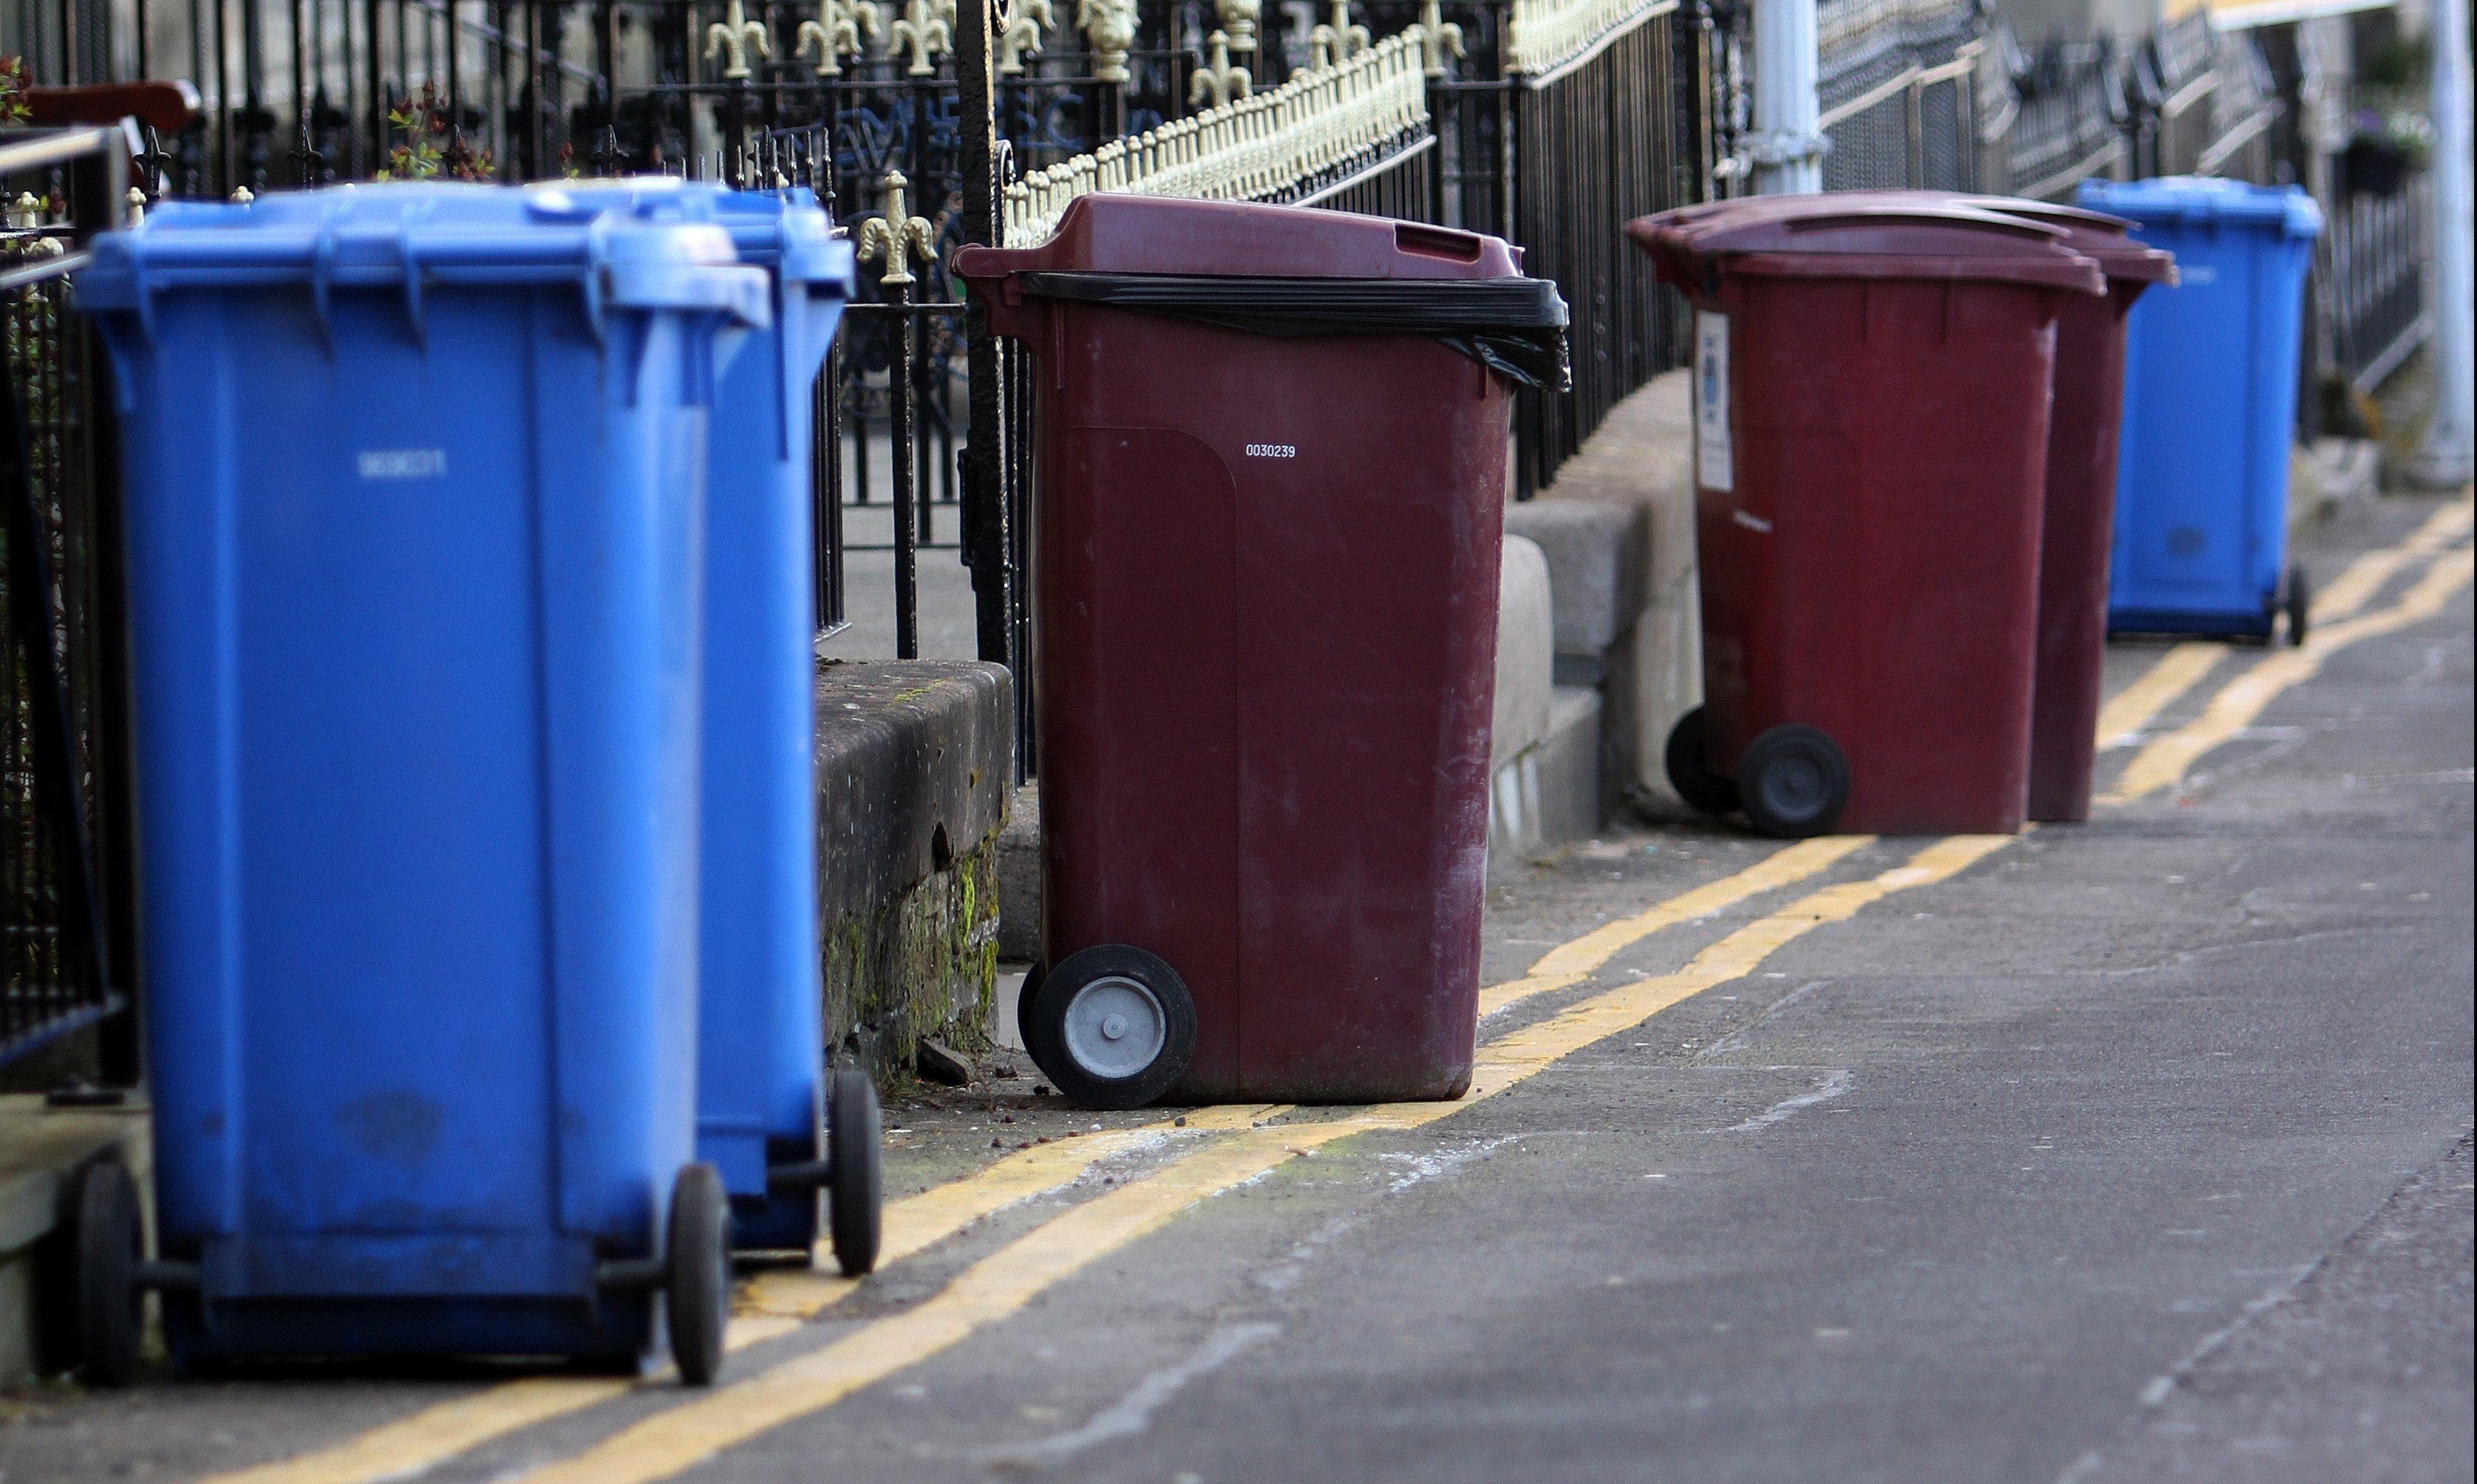 Fife Council wheelie bins in St Andrews.